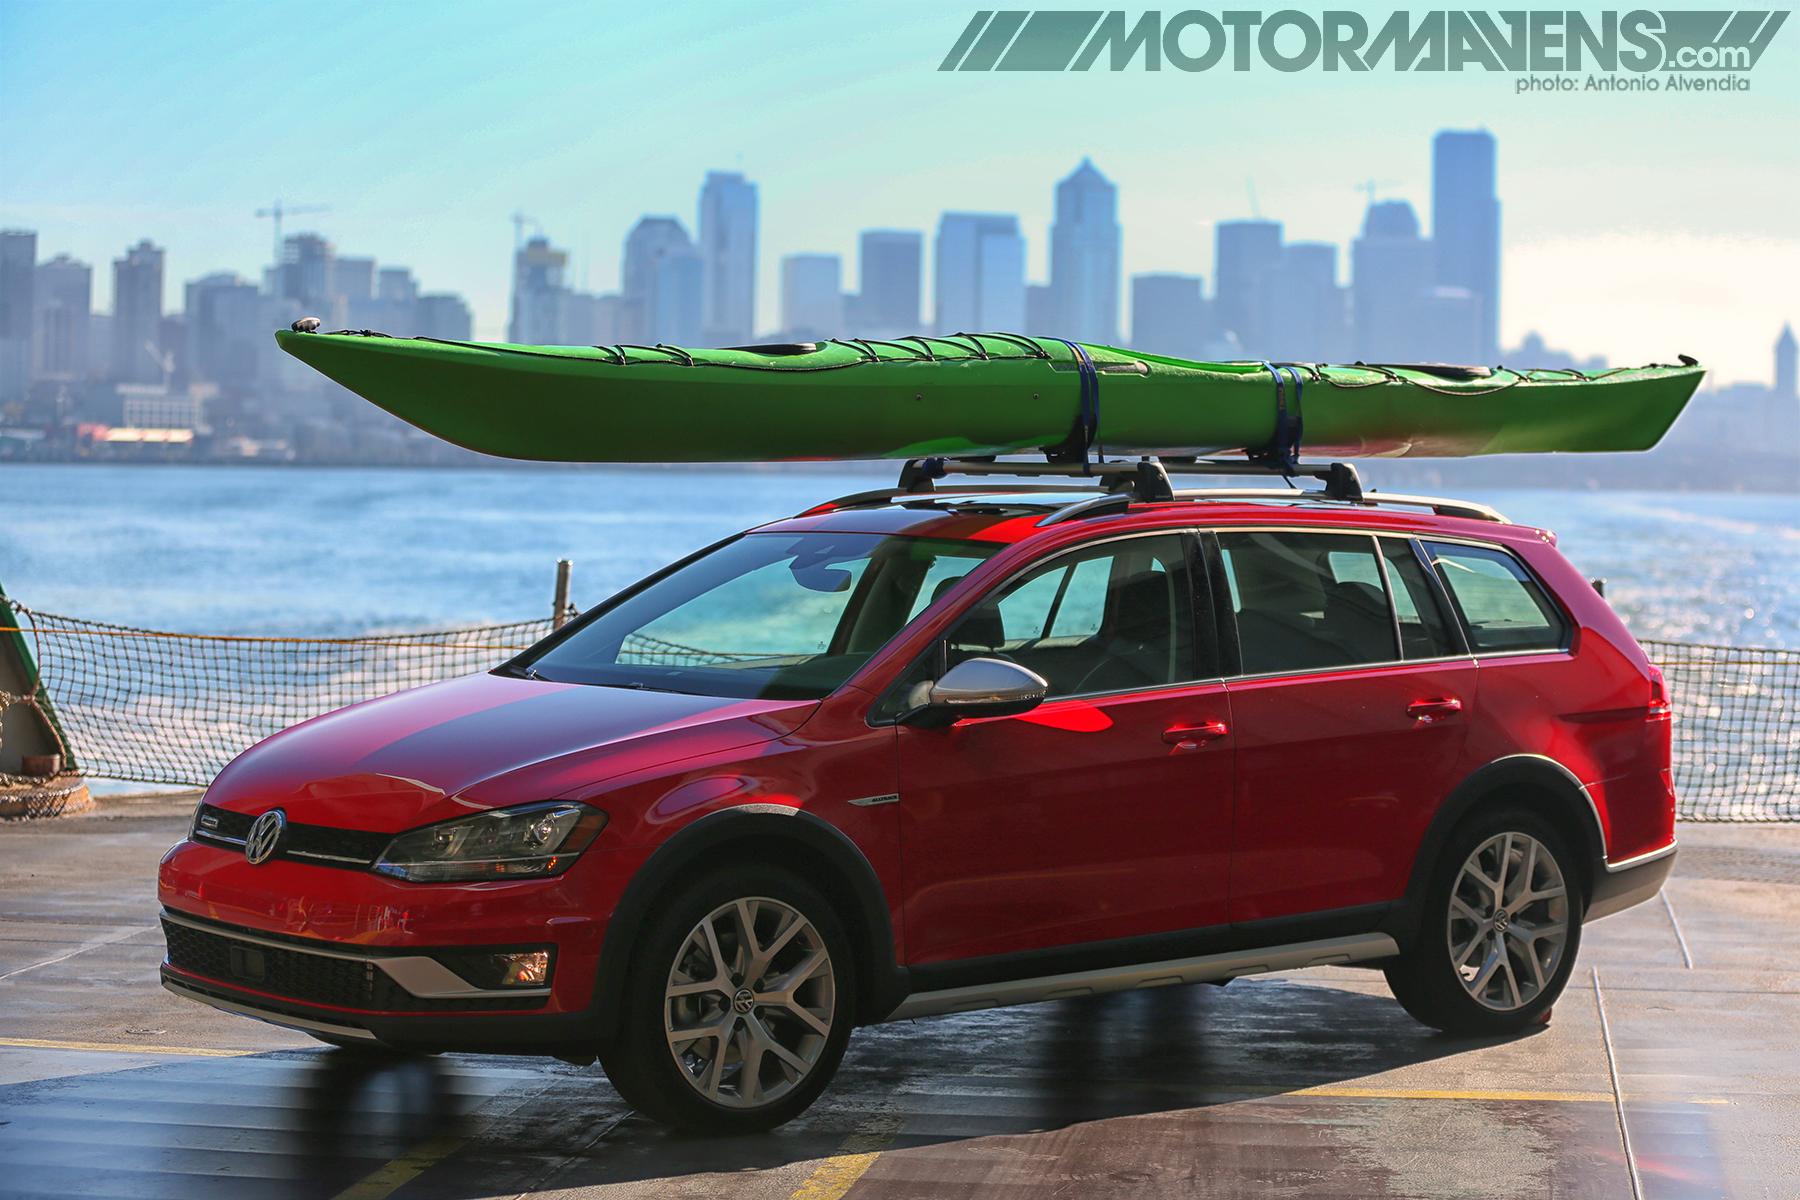 VW Golf. Golf Alltrack, Volkswagen, Sportwagen, VW, Bainbridge Island Ferry